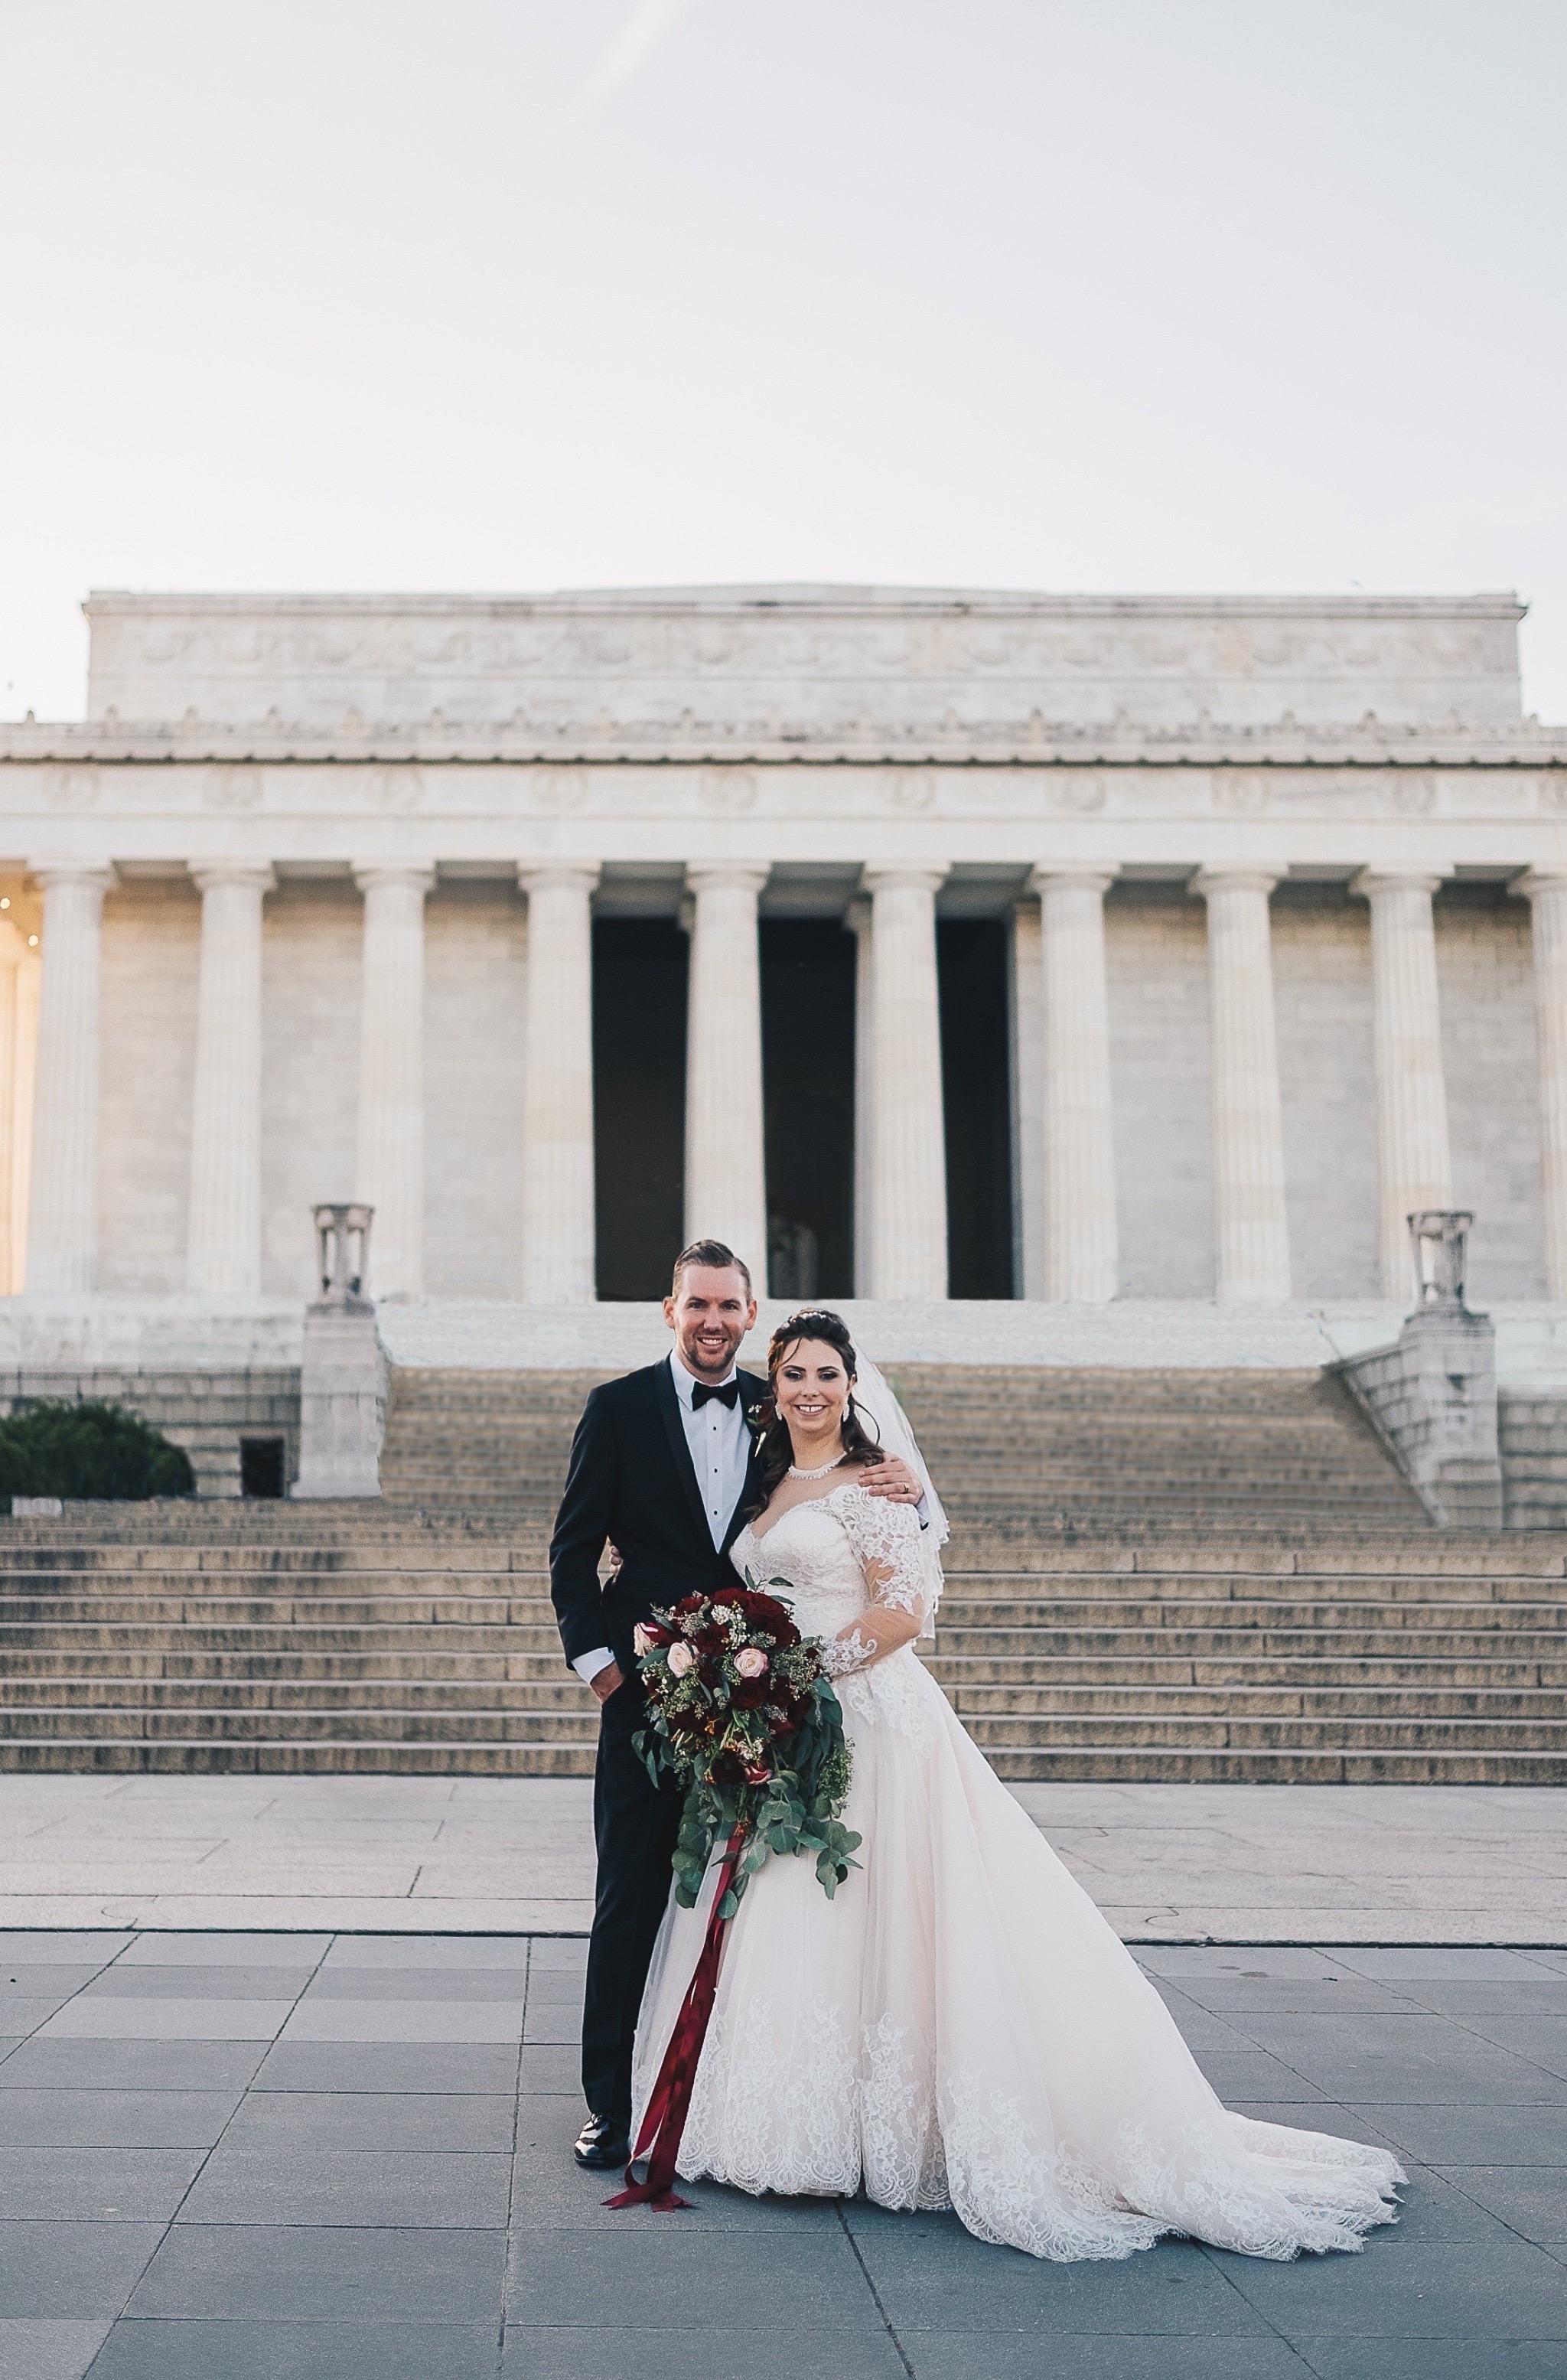 Nathan Elaina Romantic Capitol Wedding in Washington DC by Jonathan Hannah Photography11.jpg